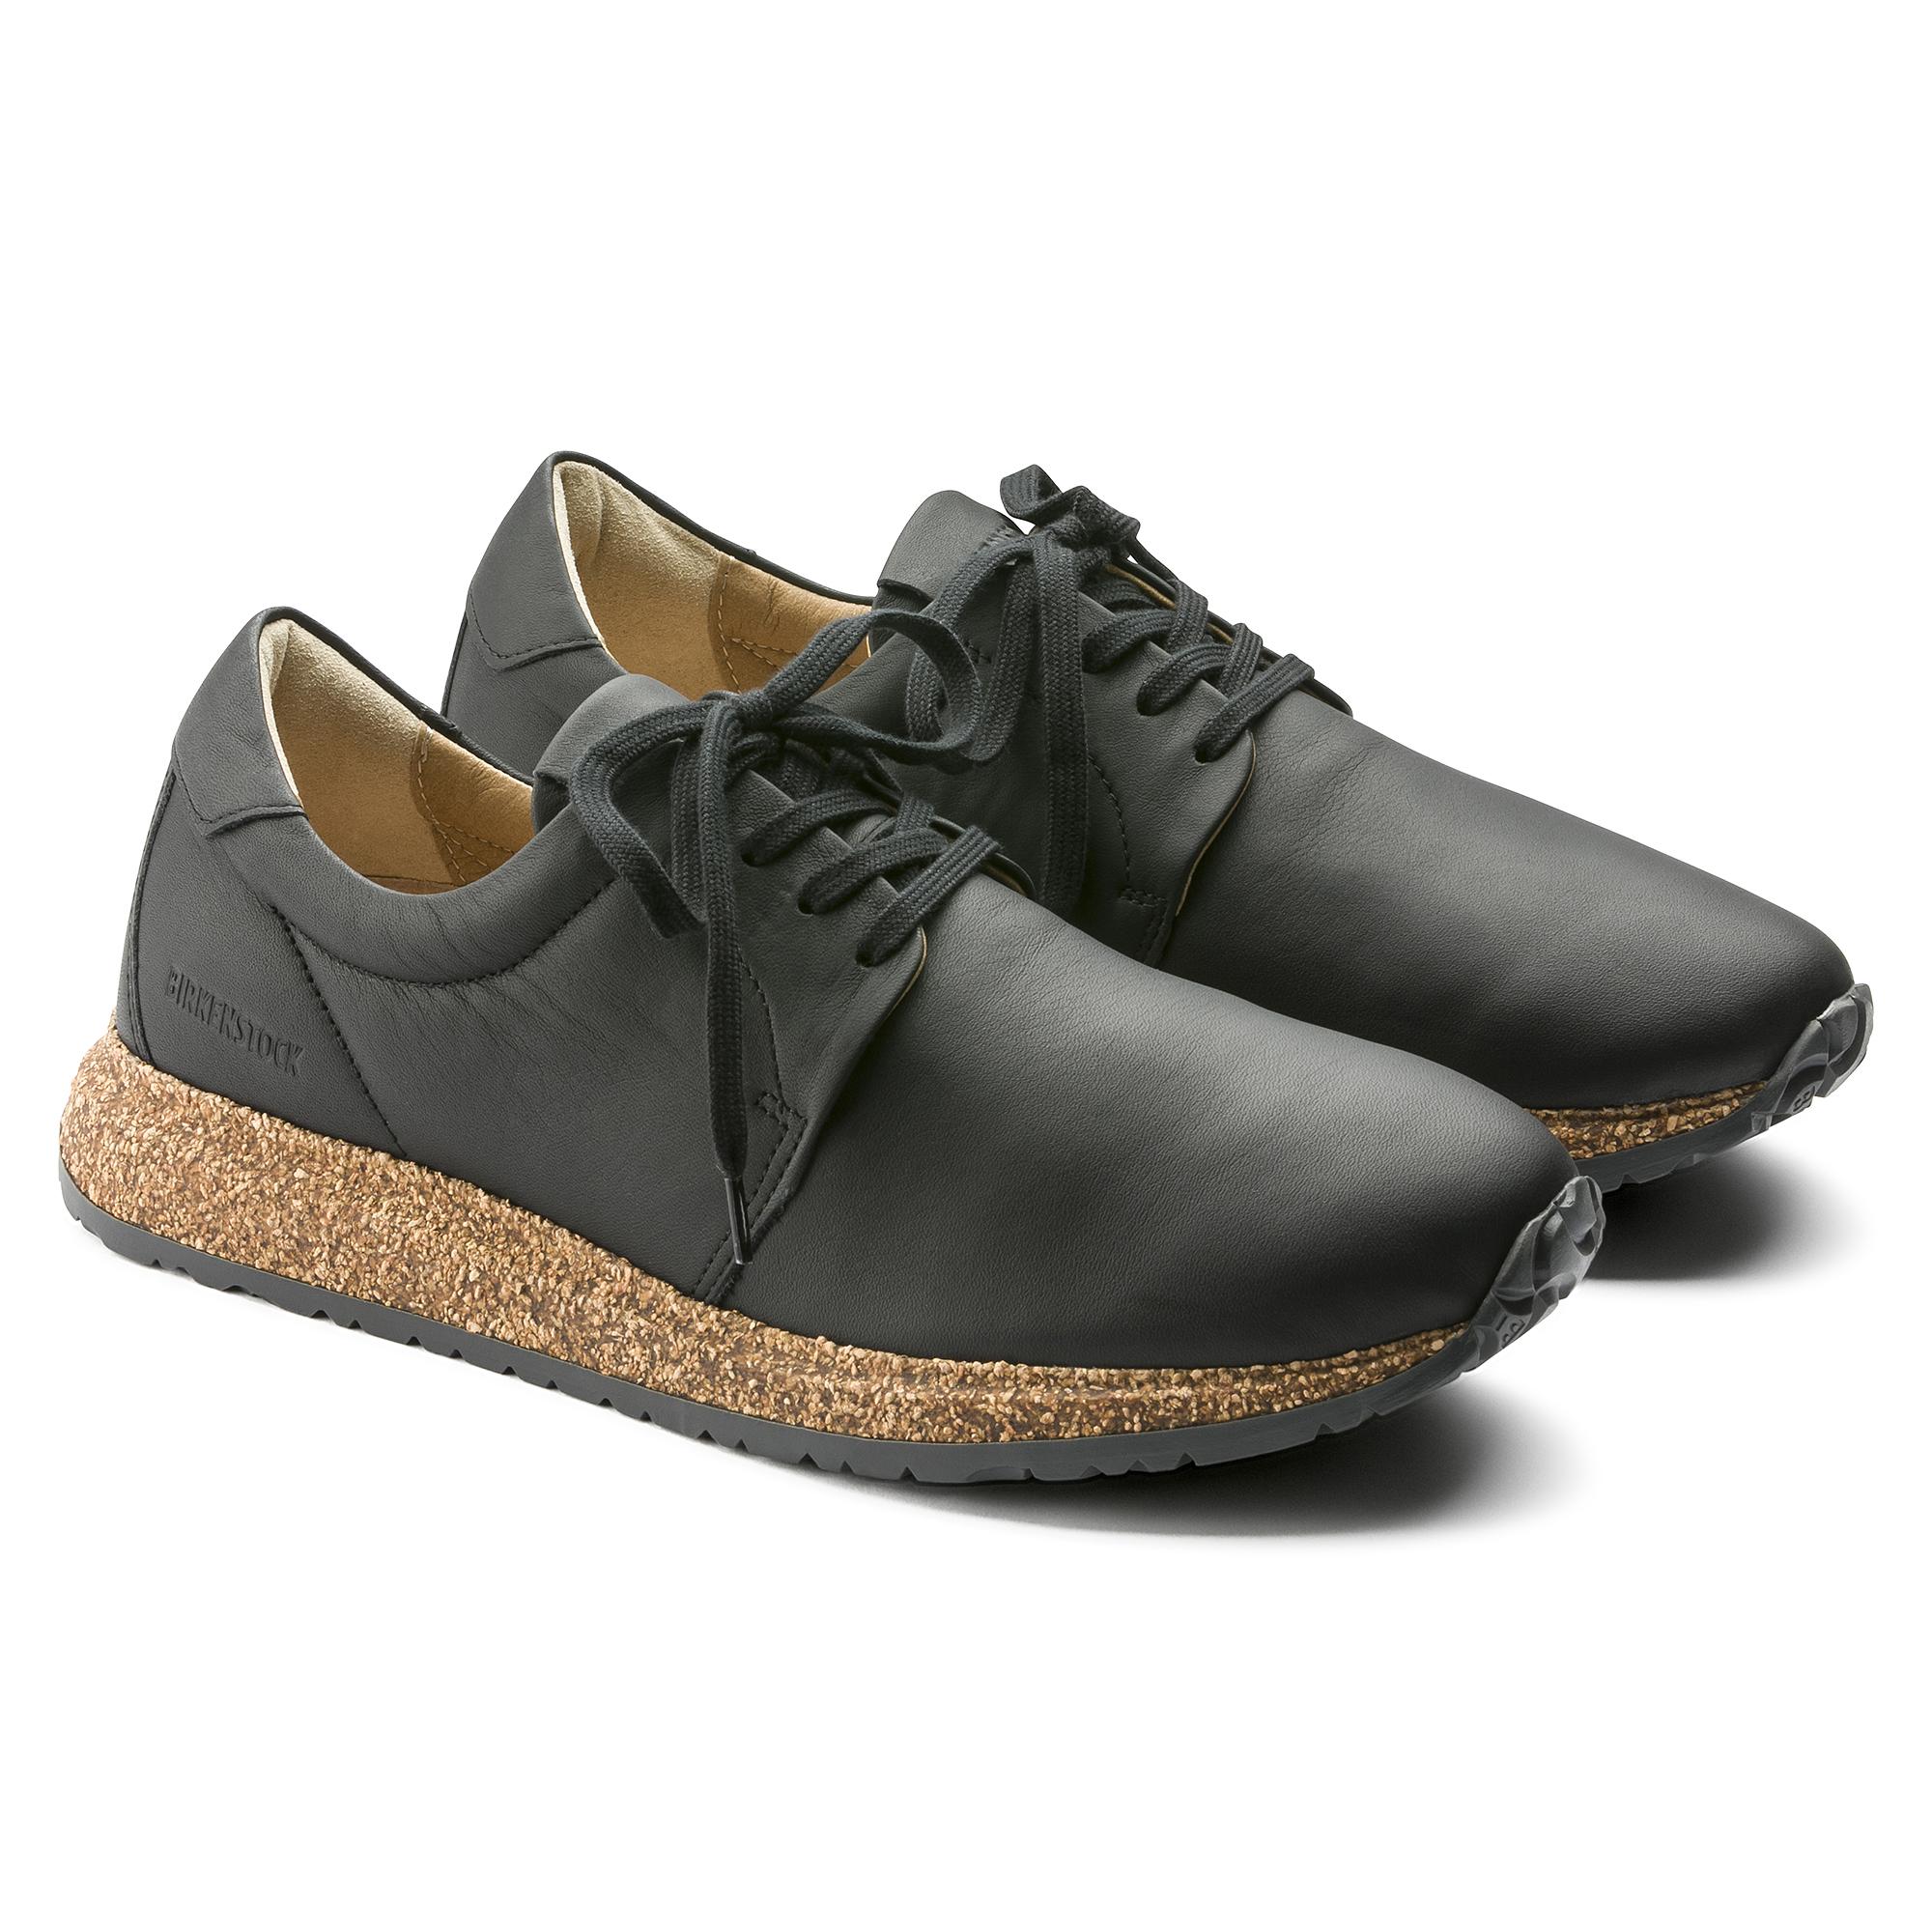 Wrigley Natural Leather Black | shop